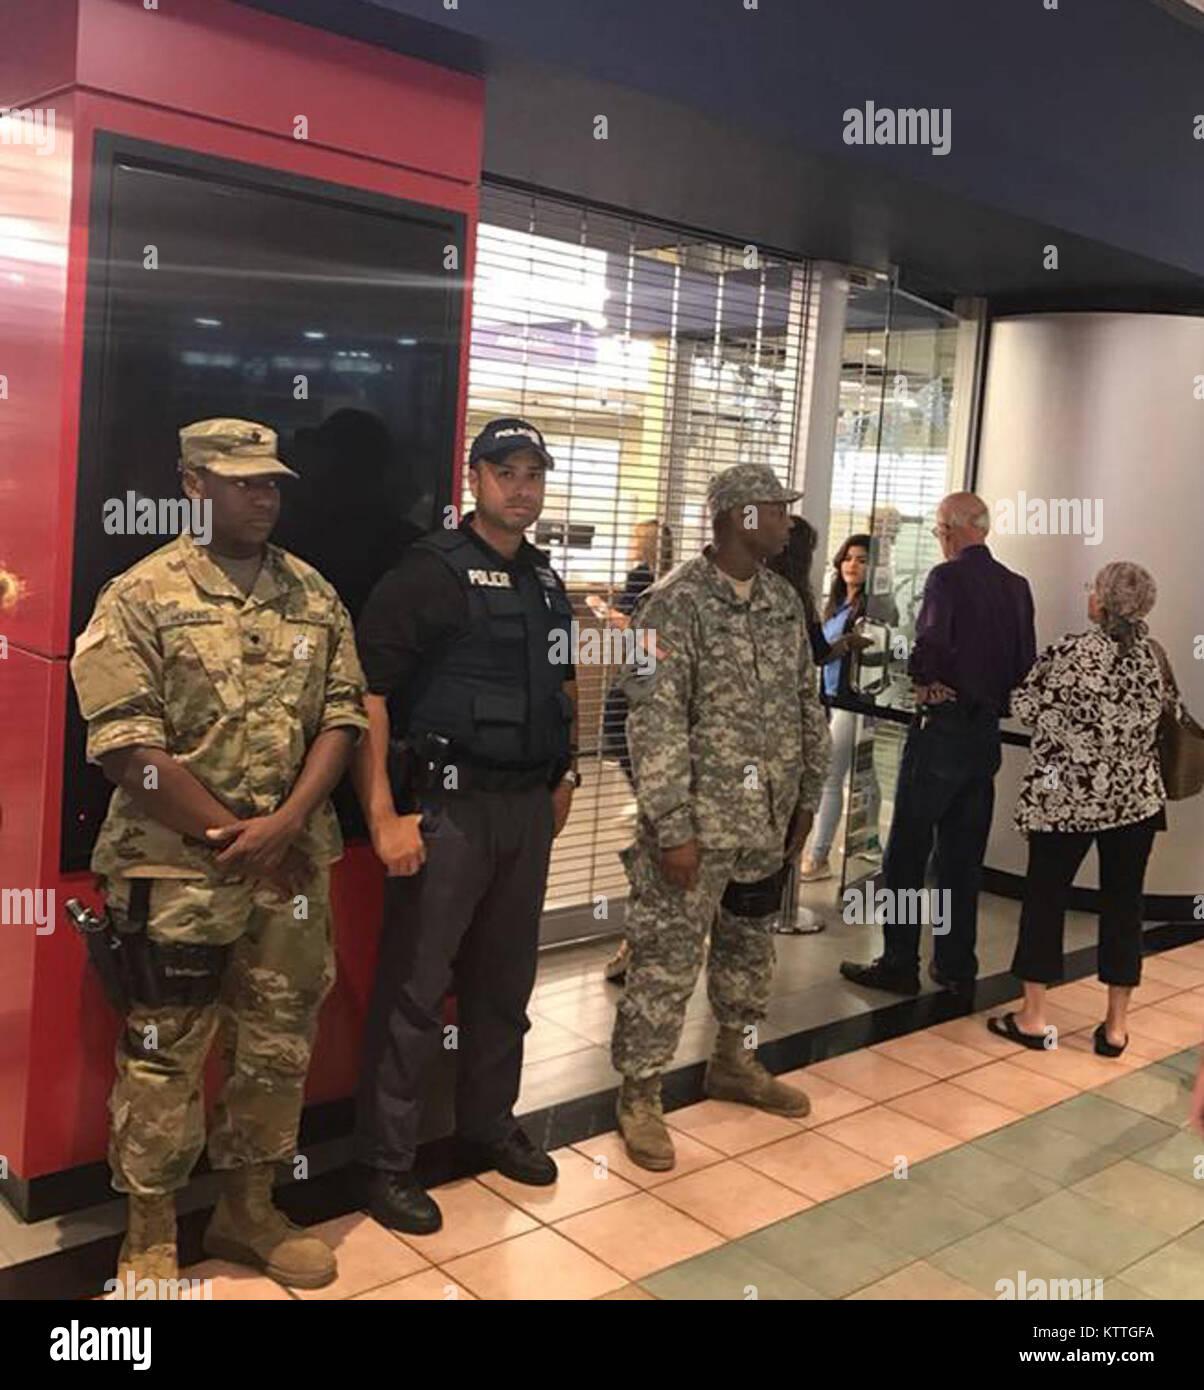 New York Army National Guard SPC Malachi Hopkins and Sgt. Desmond Hall provide security alongside a San Juan Puerto - Stock Image